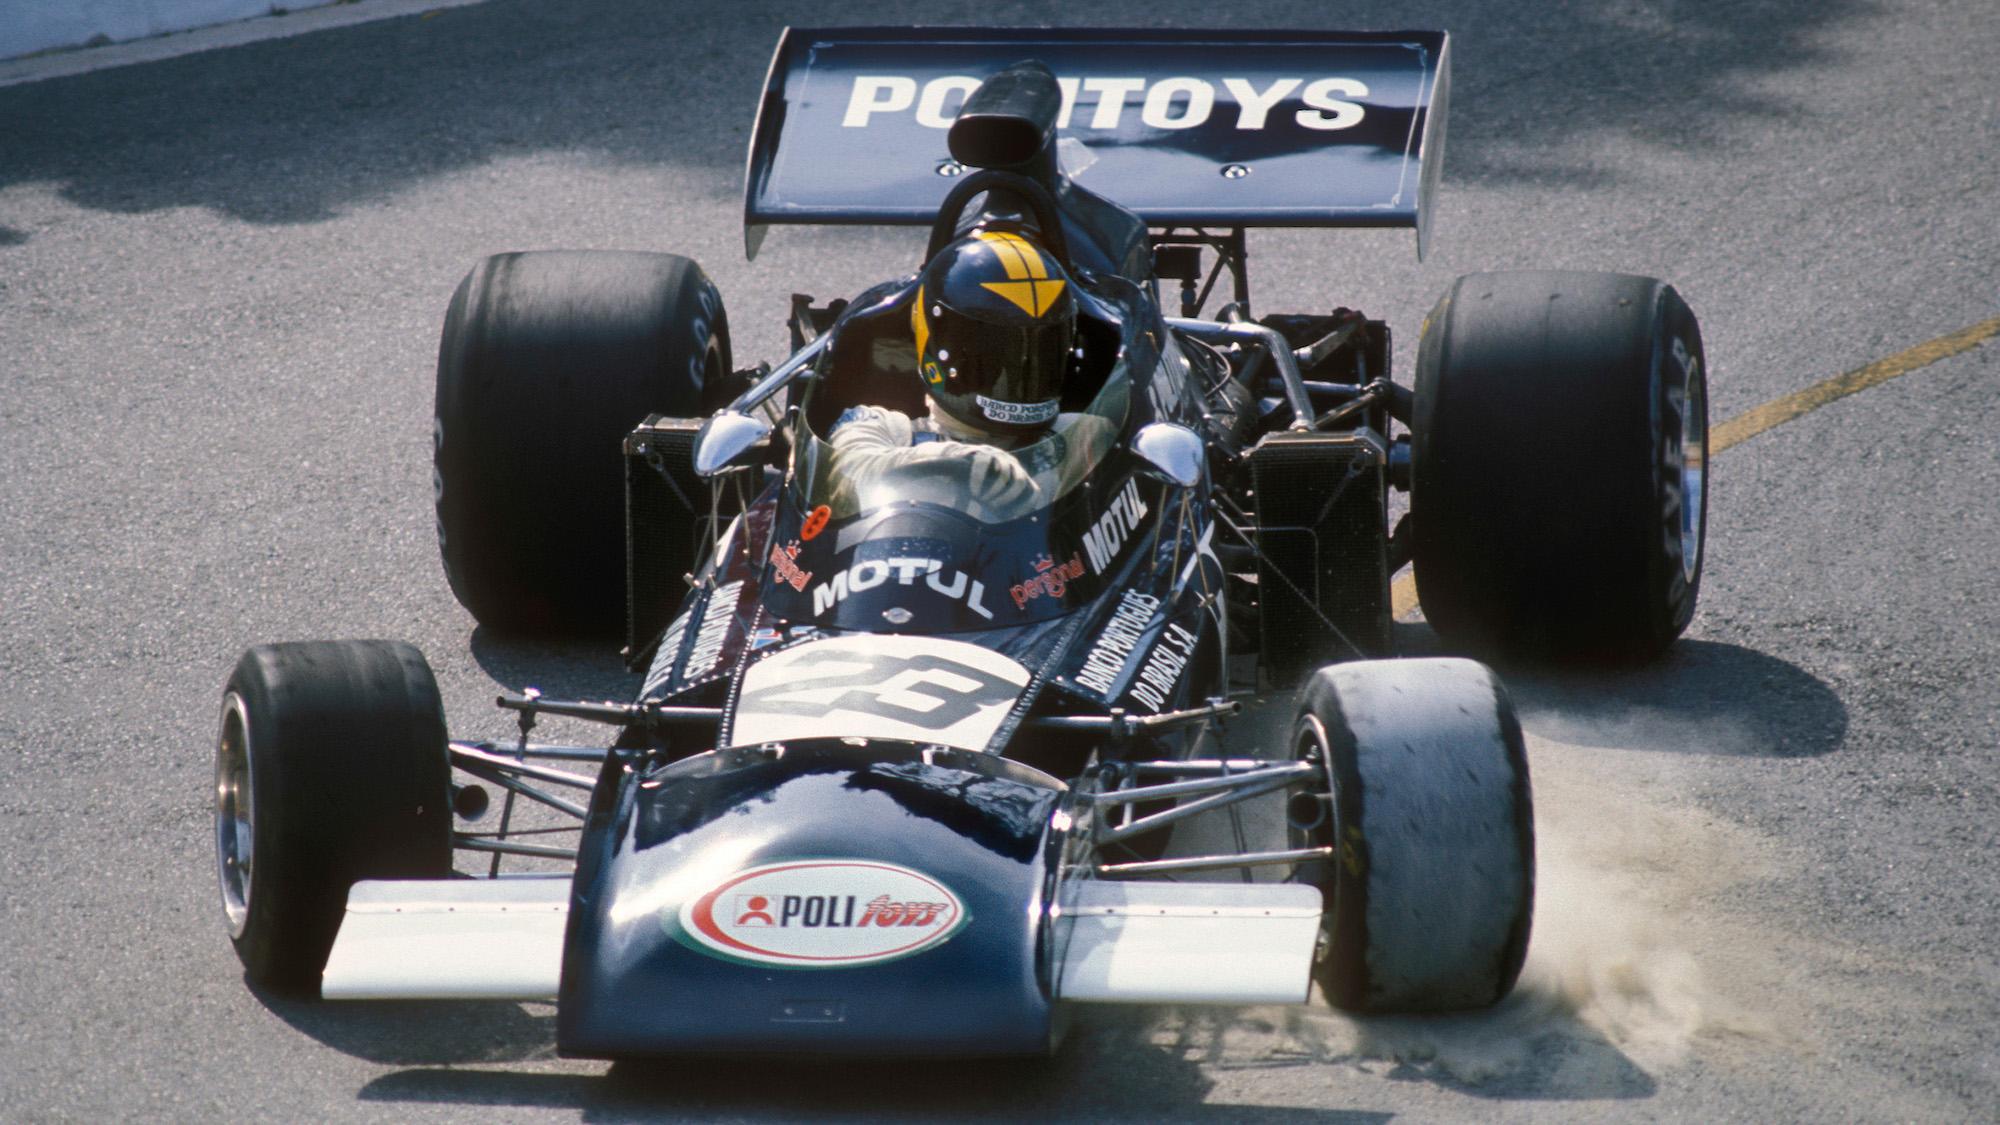 Carlos Pace in the Williams Ford at the 1972 Monaco Grand Prix